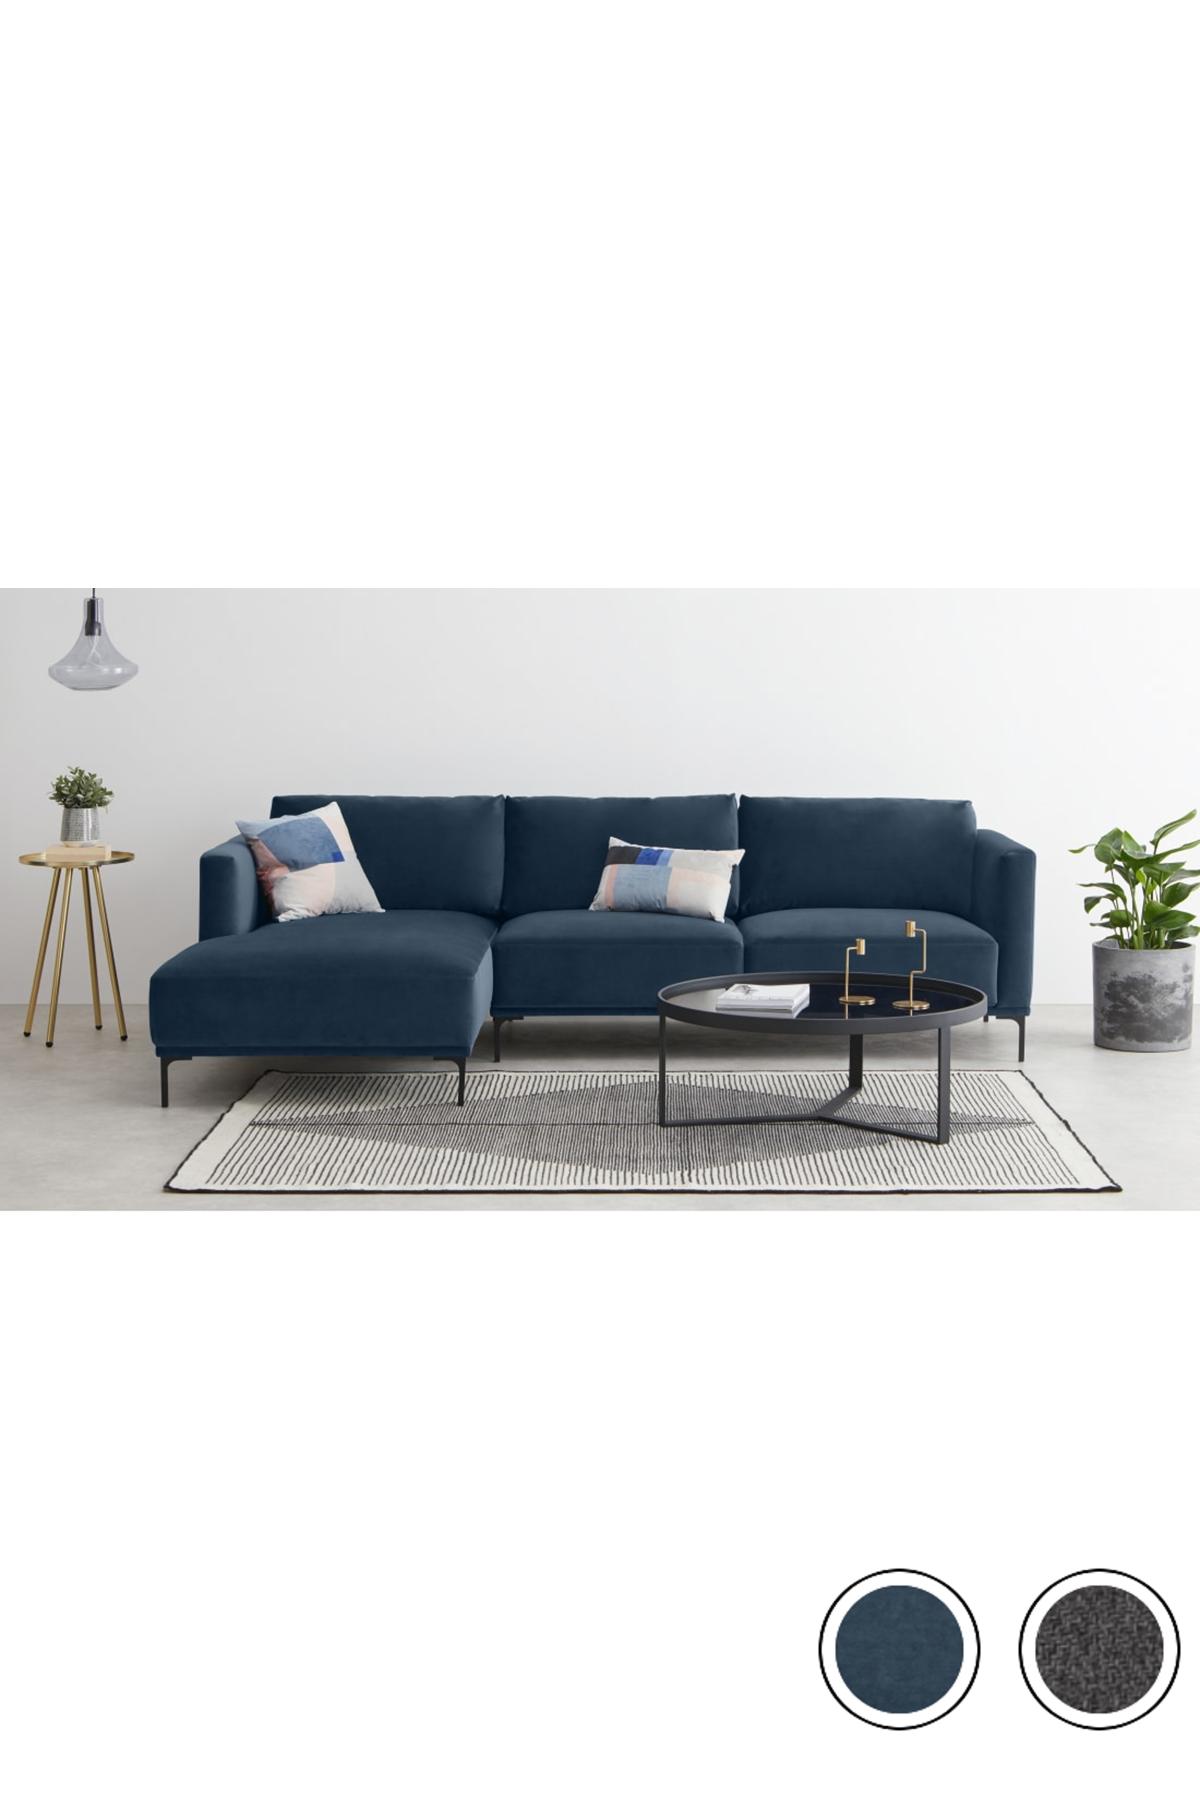 Made Sapphire Blue Sofa Sofa Corner Sofa How To Make Corner Sofa